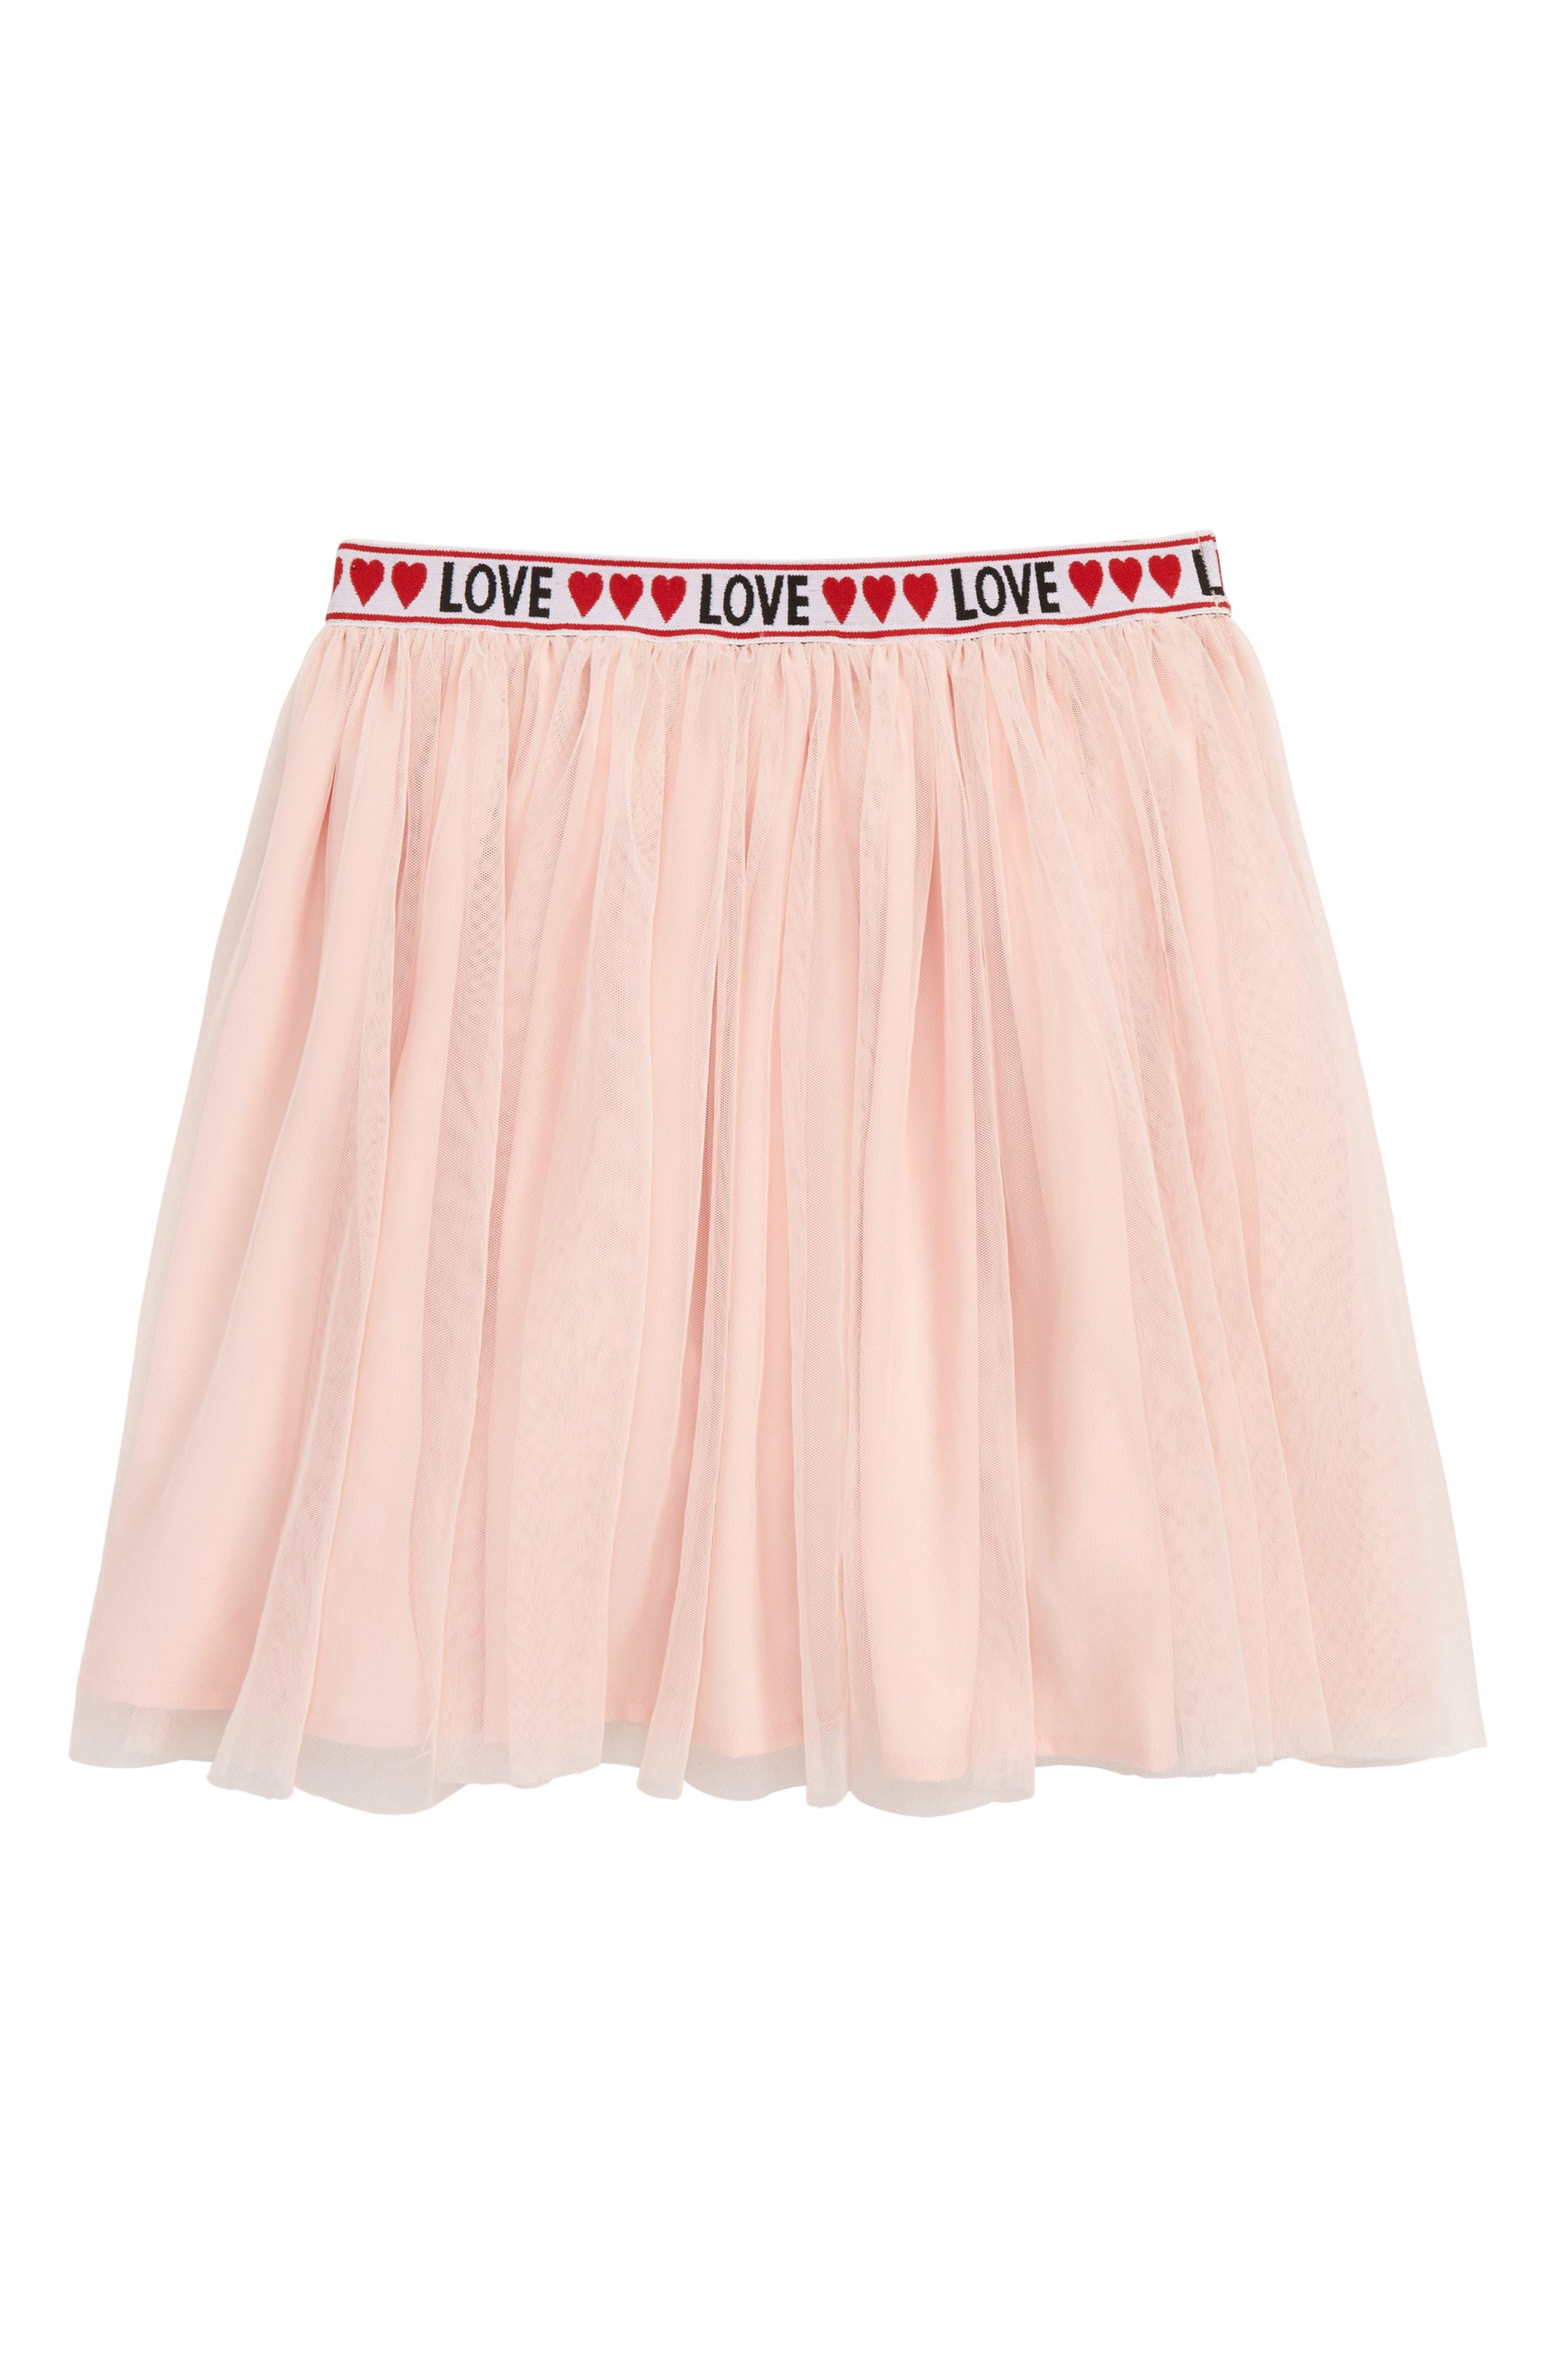 Love Tutu,                             Main thumbnail 1, color,                             PINK PEACHSKIN